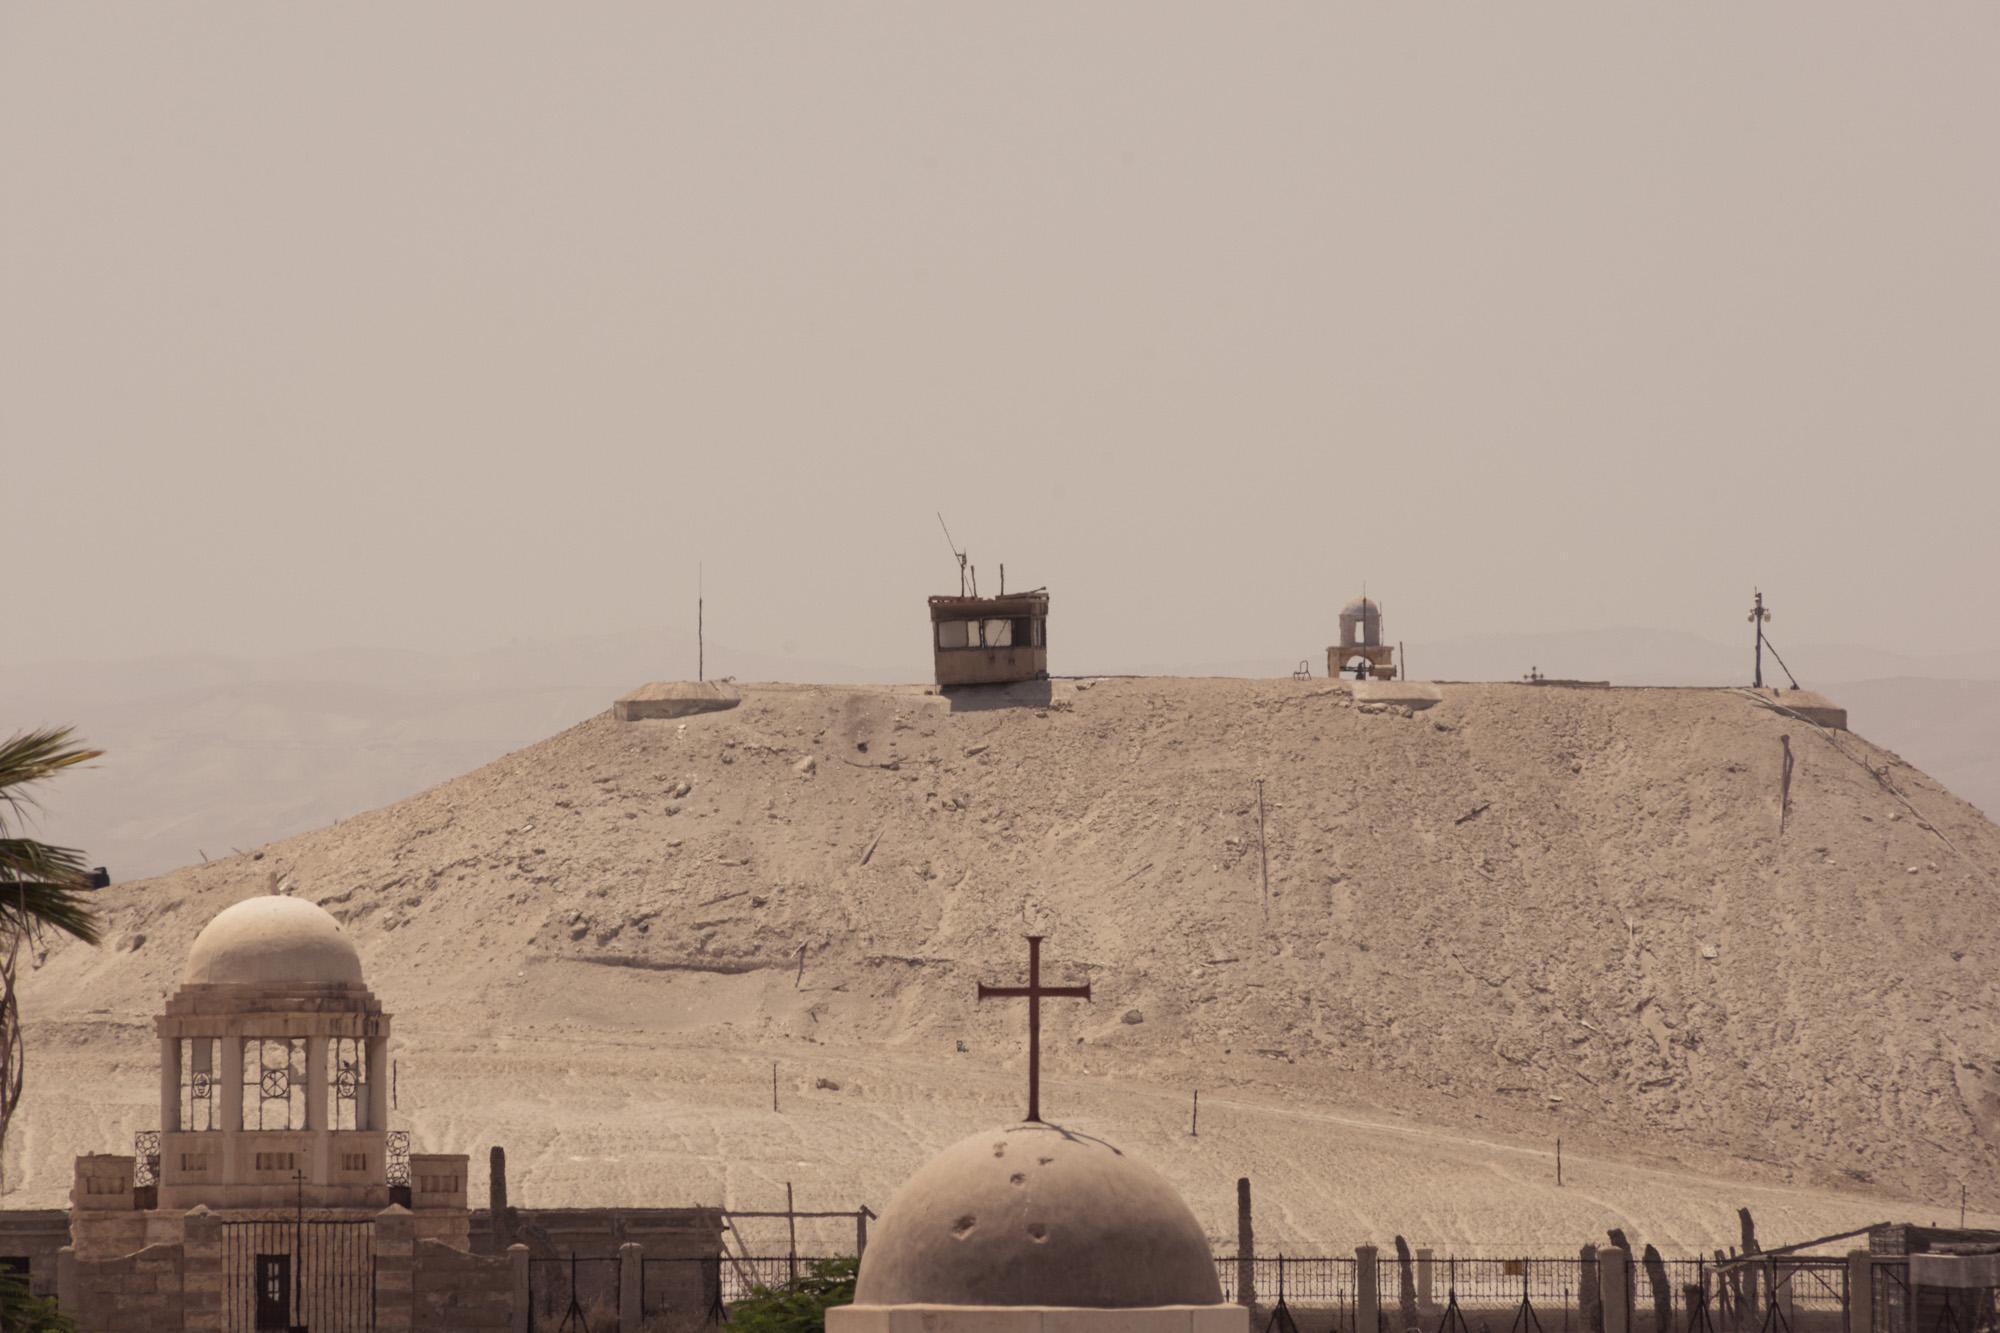 Trip through Jordan from Amman to Aqaba in july 2017.